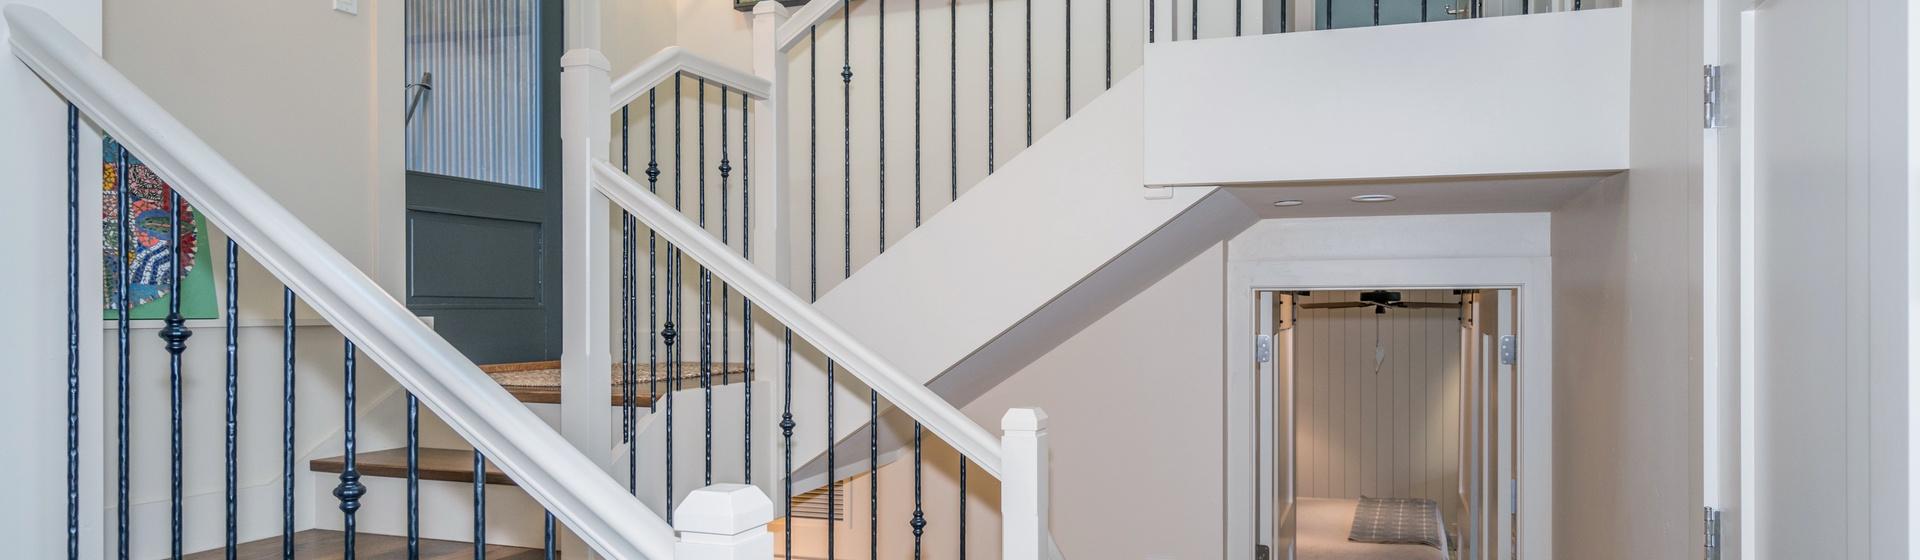 11.5-Telluride-The-Masonry-East-Stairs.jpg